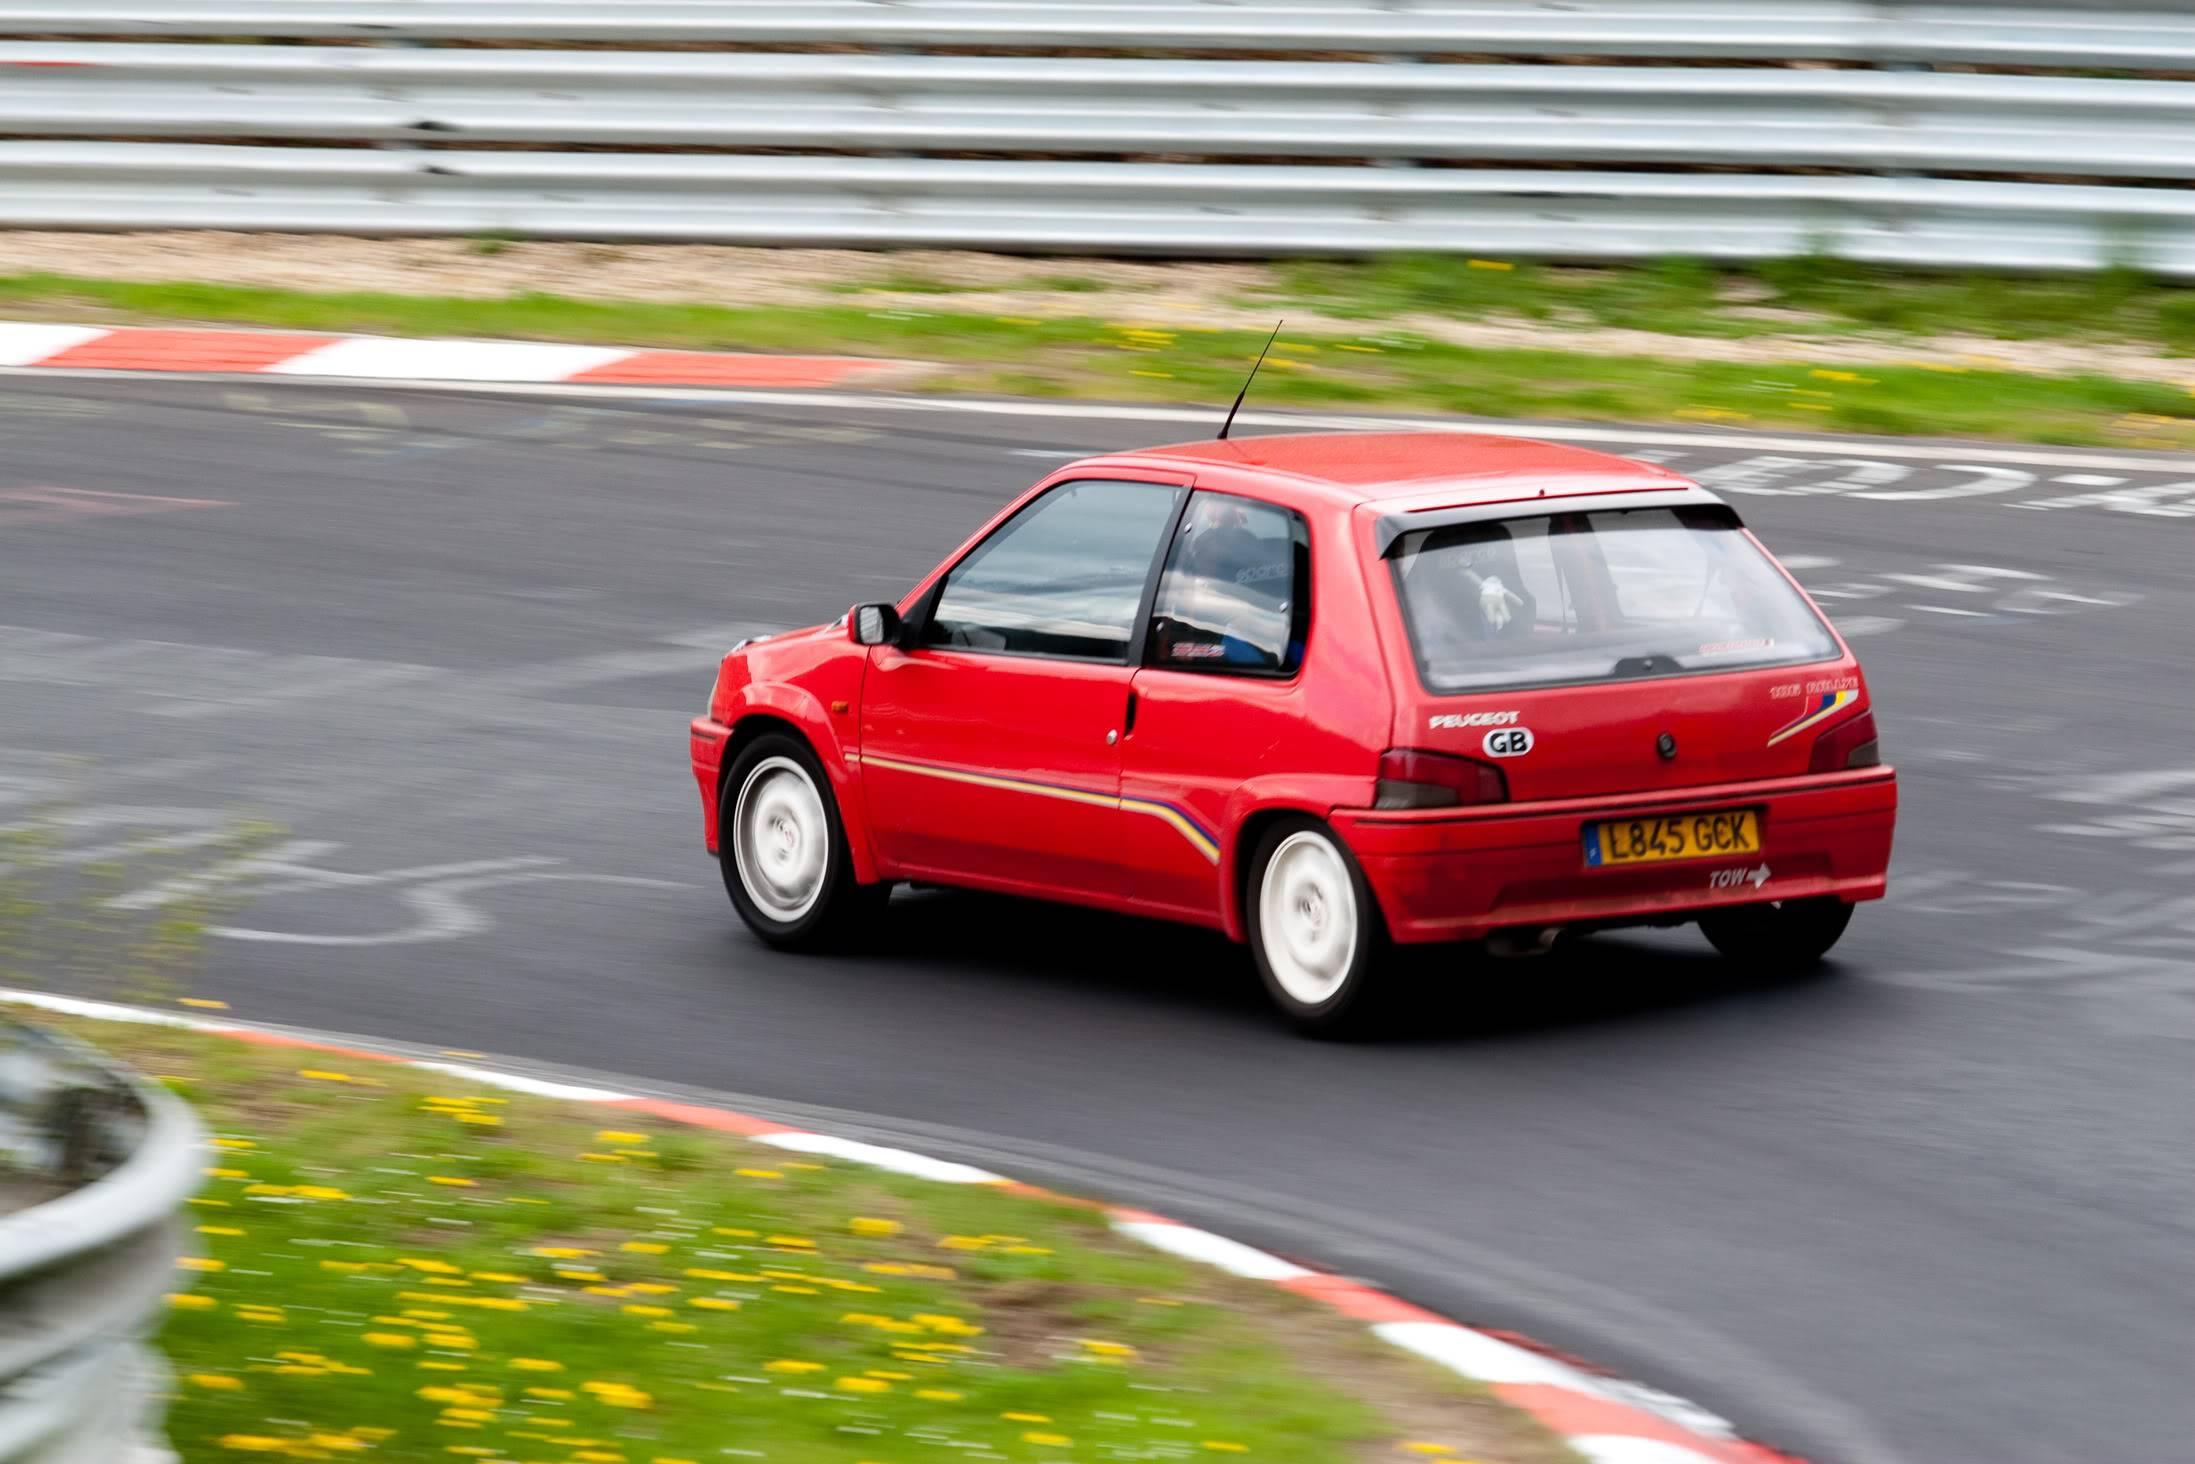 low mileage JP4'd S1 rallye (153 bhp) really nice spec! _MG_1911